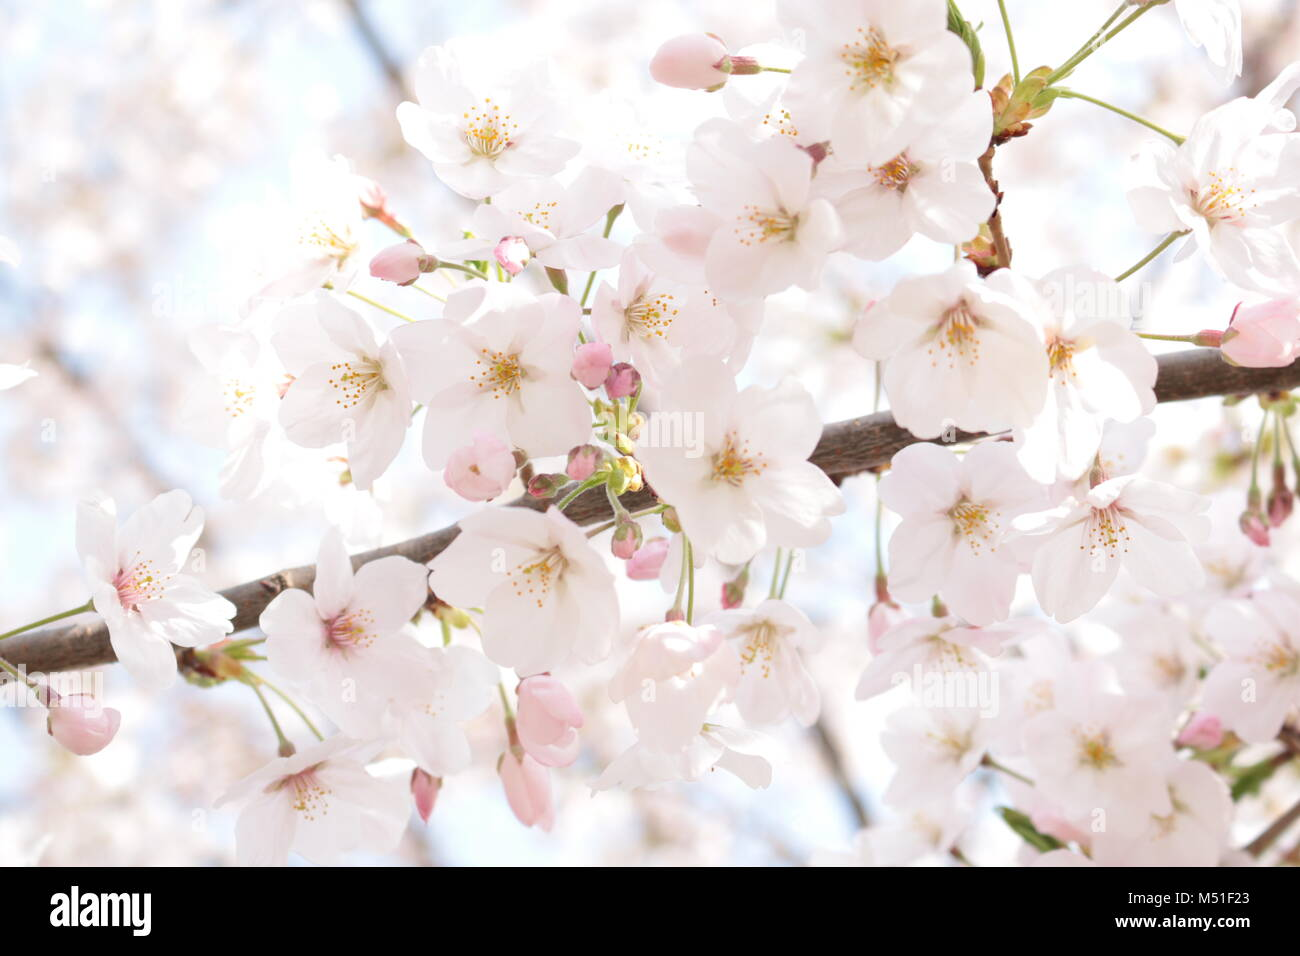 the dreamy sakura (cherry blossom) - Stock Image